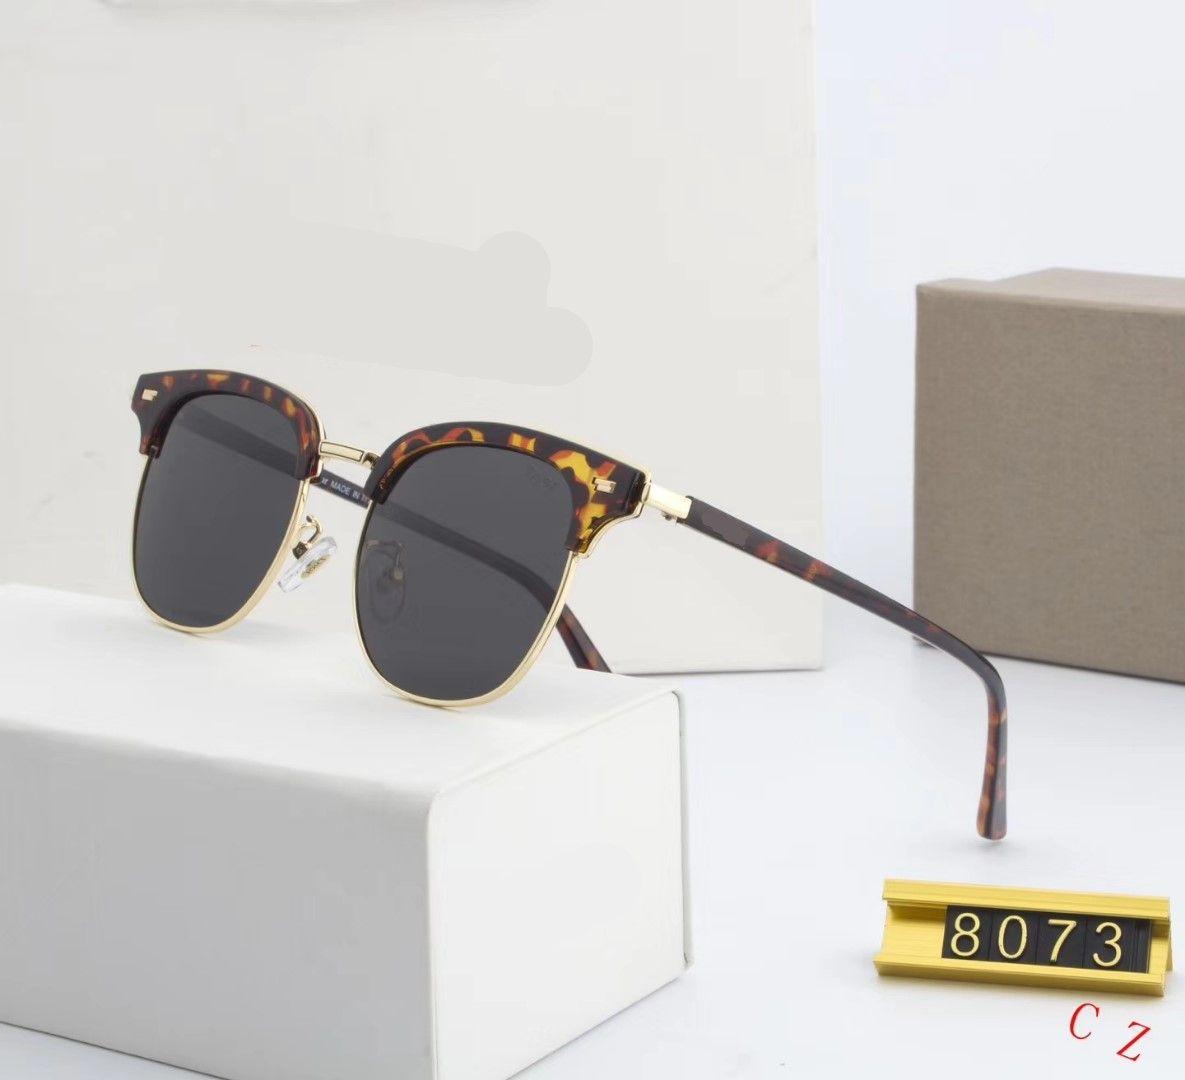 f106843f8bd Free Ship Brand Sun Glasses Mens Fashion Evidence Sunglasses Designer  Eyewear For Mens Womens Sun Glasses New Glasses 8073 Cool Sunglasses Custom  Sunglasses ...